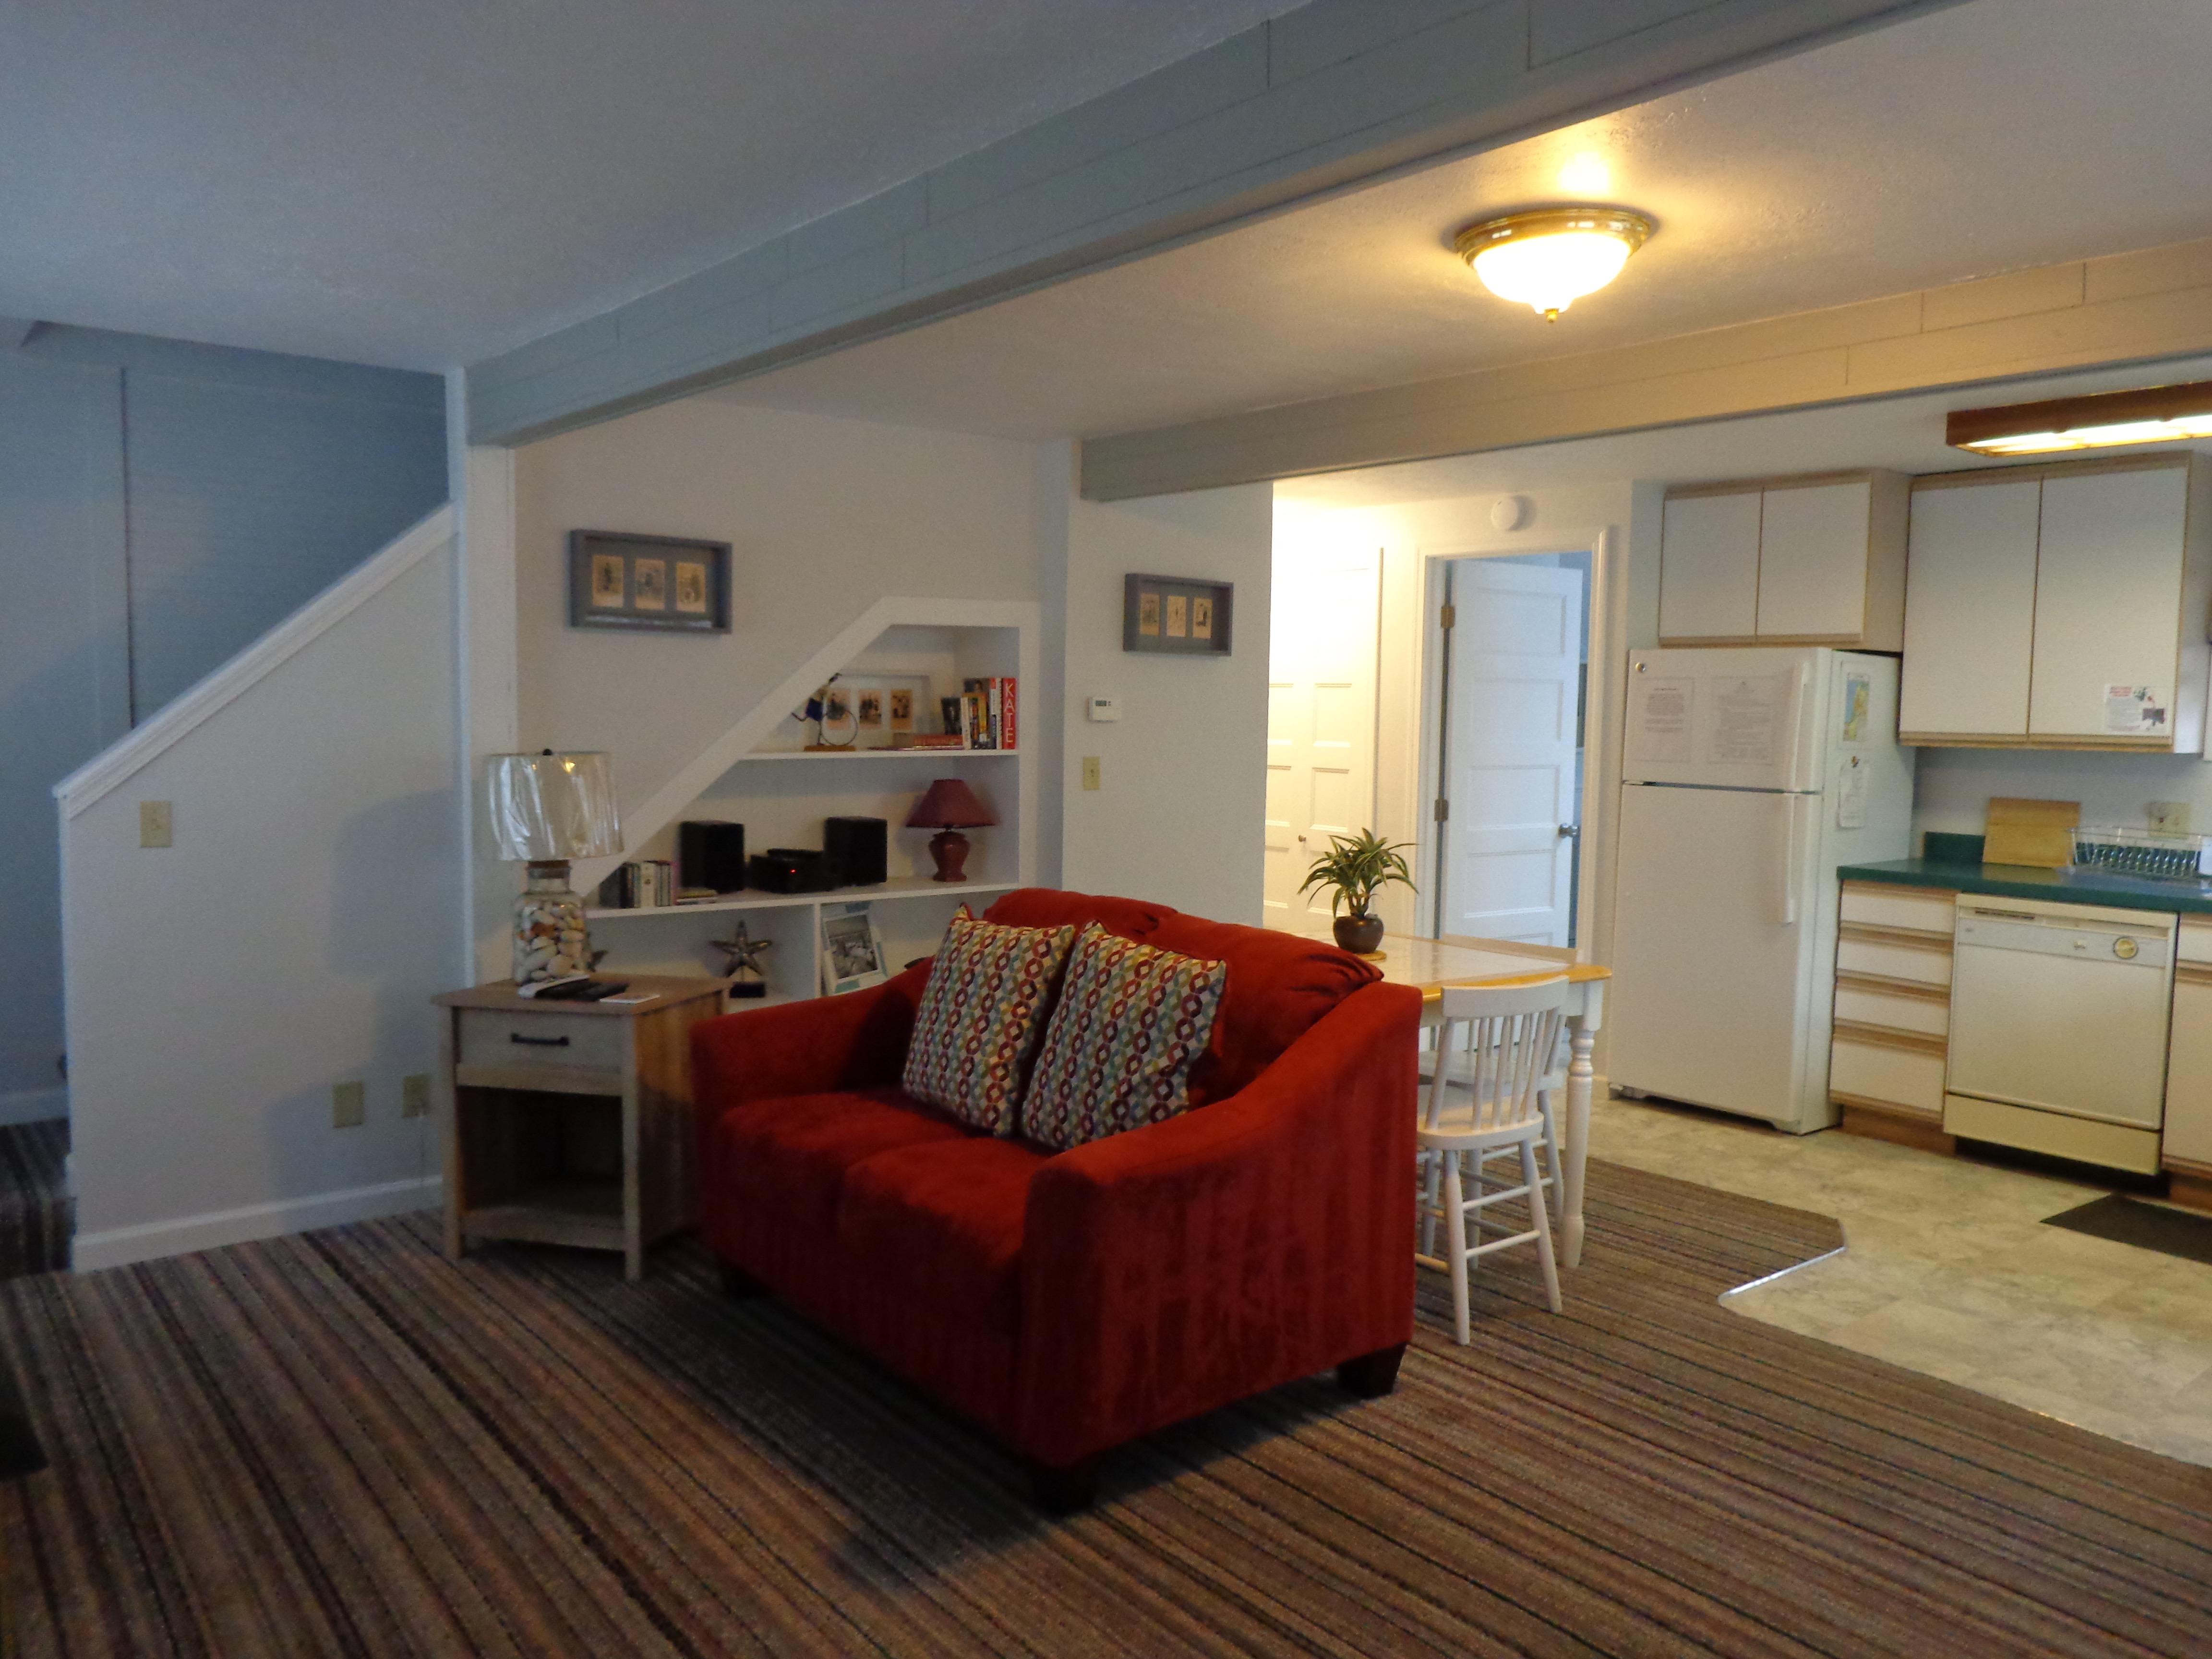 the friendly kid comfort welcome best gearhart resorts seaside family oregon comforter inn hotels to dh ocean coast